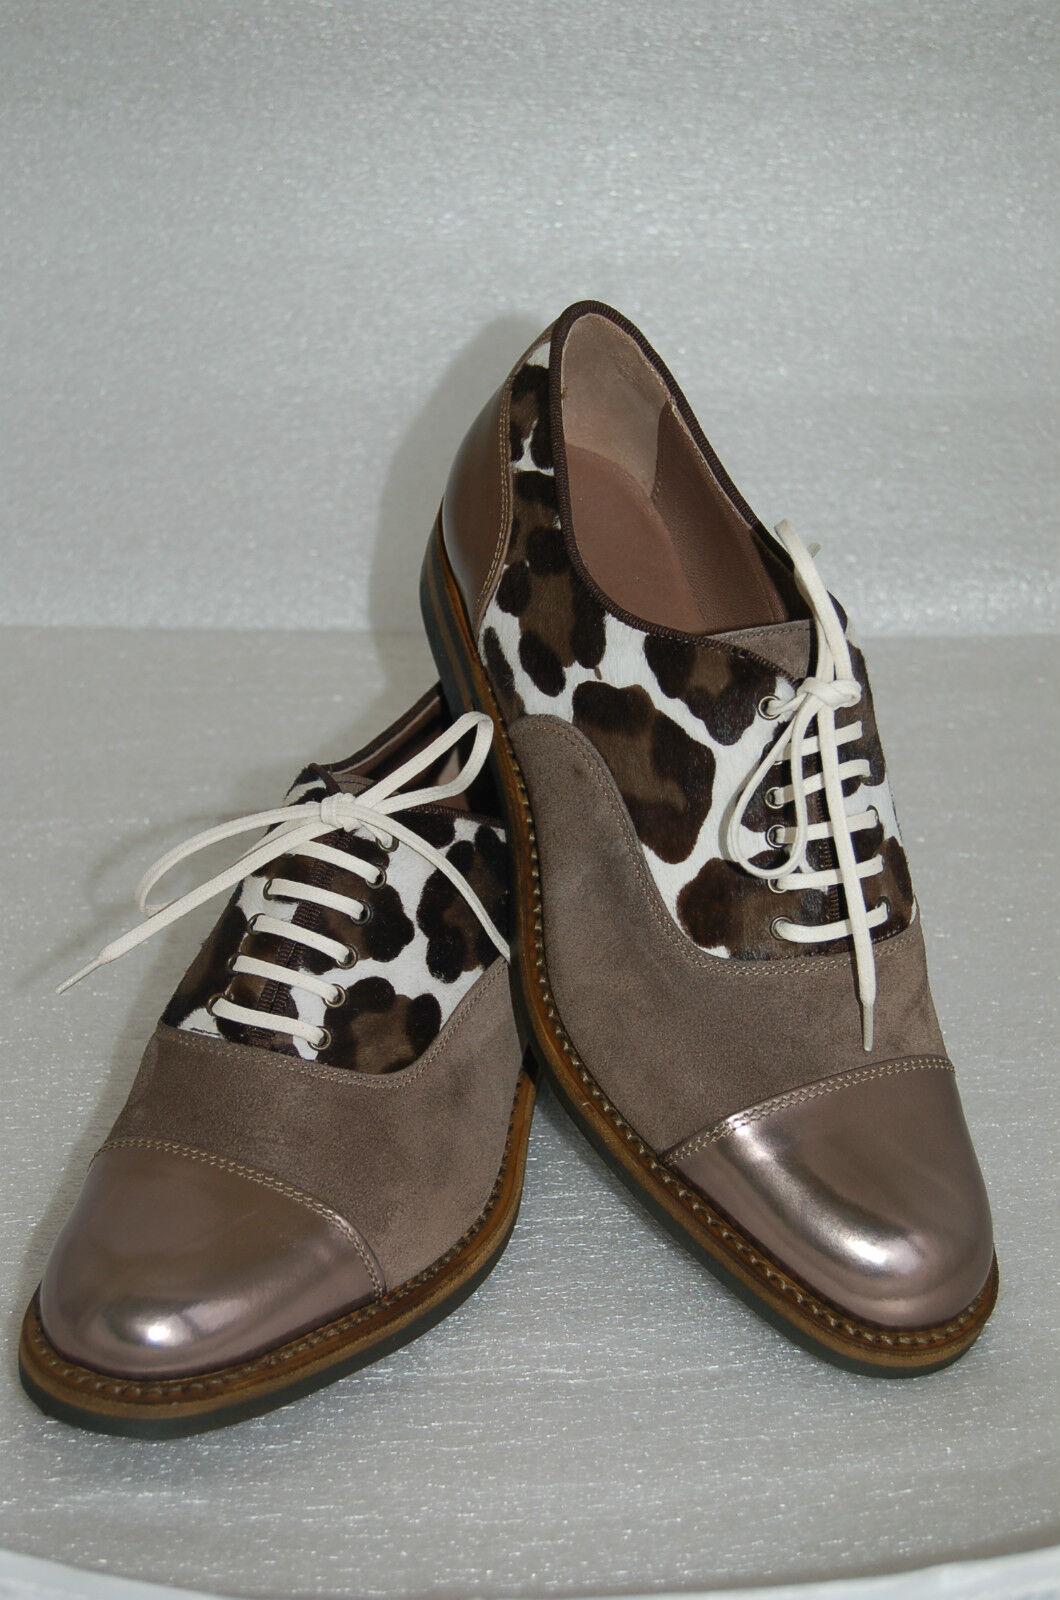 WOMAN CAPTOE CALF/SUEDE/ OXFORD - 40 eu- BRONZE CALF/SUEDE/ CAPTOE PRINTED PONY- LTH SOLE+DAINITE c9b5f3